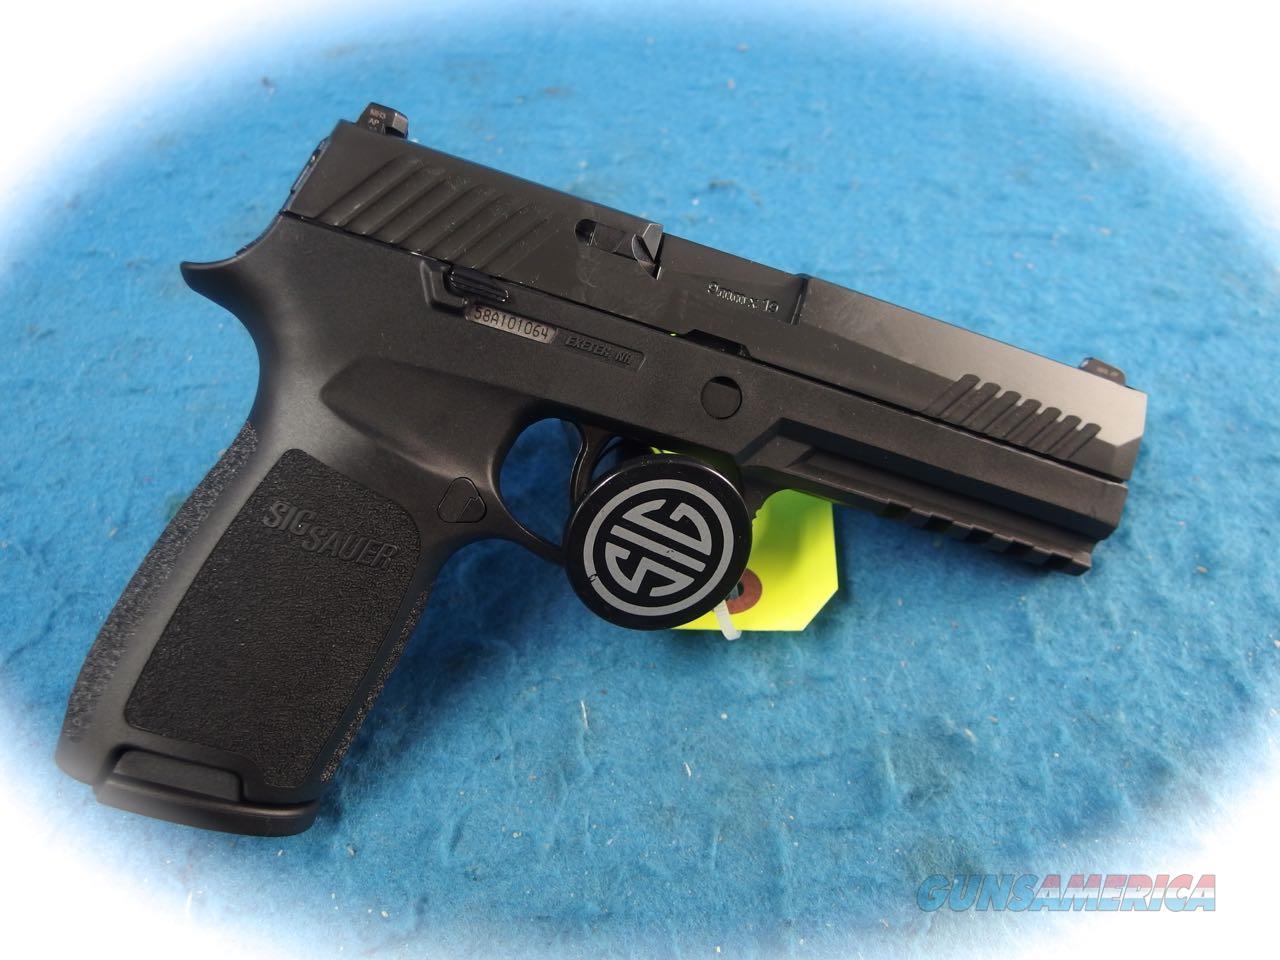 Sig Sauer P320 Full Size 9mm Semi Auto Pistol Model 320F-9-BSS **New**  Guns > Pistols > Sig - Sauer/Sigarms Pistols > P320